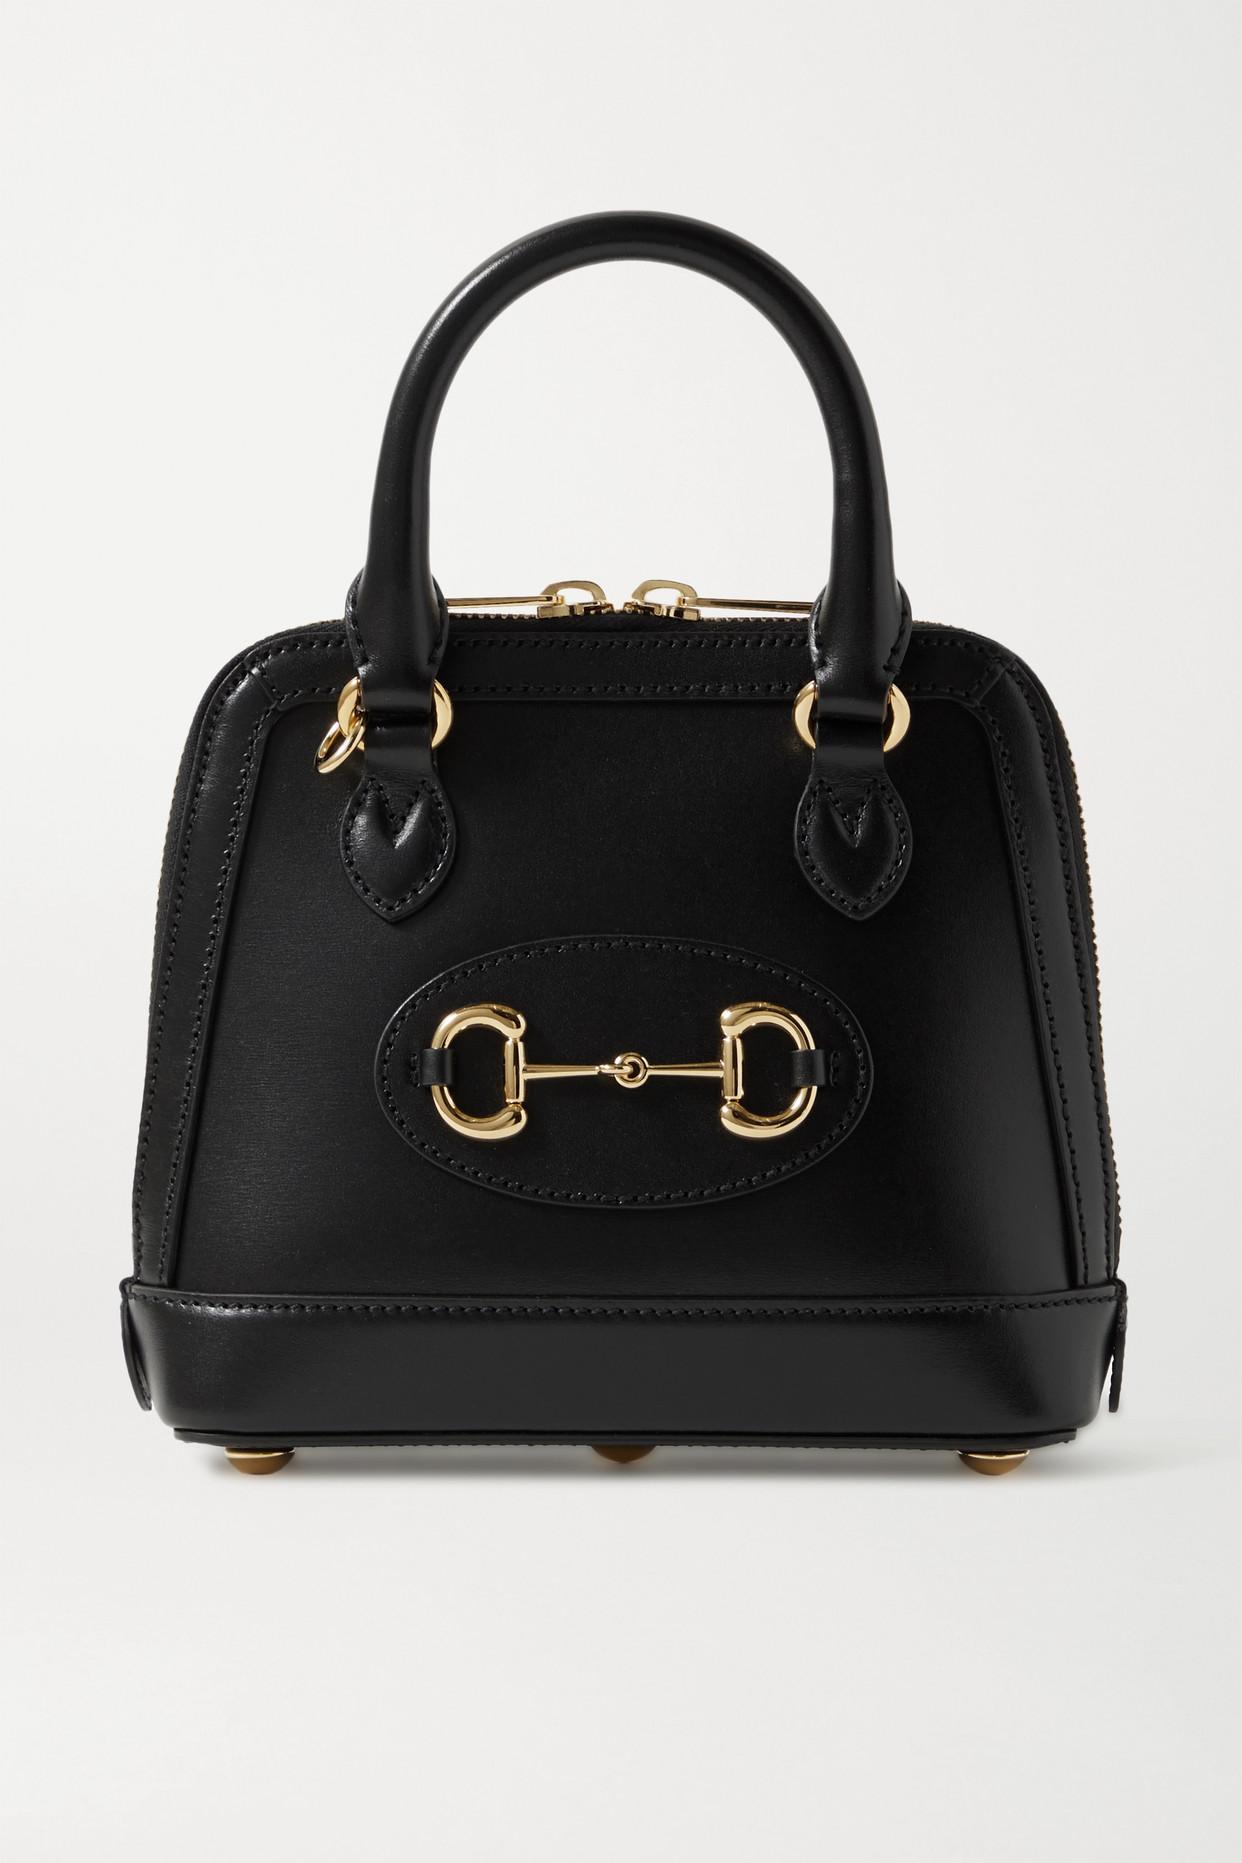 GUCCI - + Net Sustain Horsebit 1955 Mini Leather Tote - Black - one size